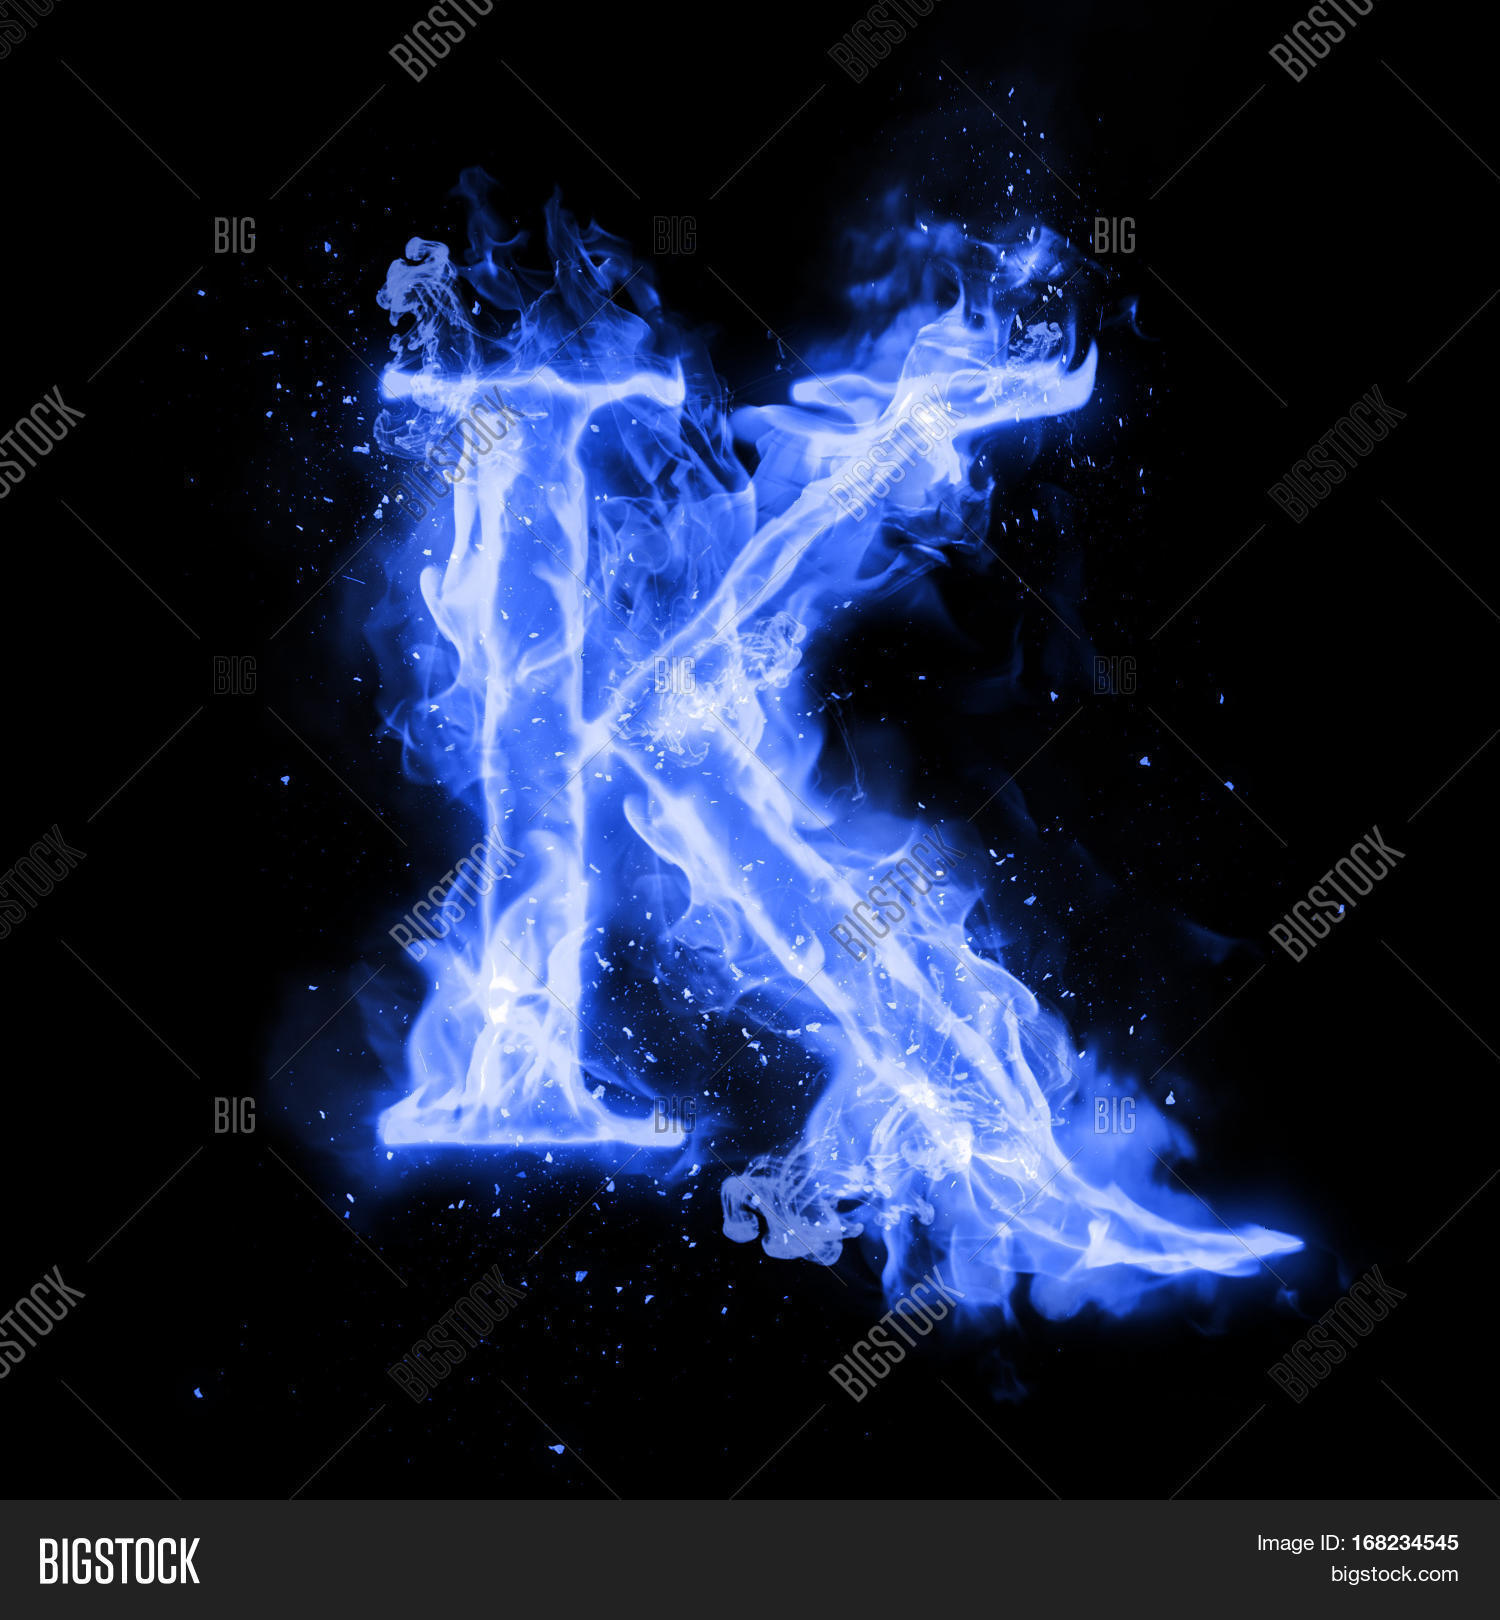 fire letter k burning blue flame. image & photo | bigstock